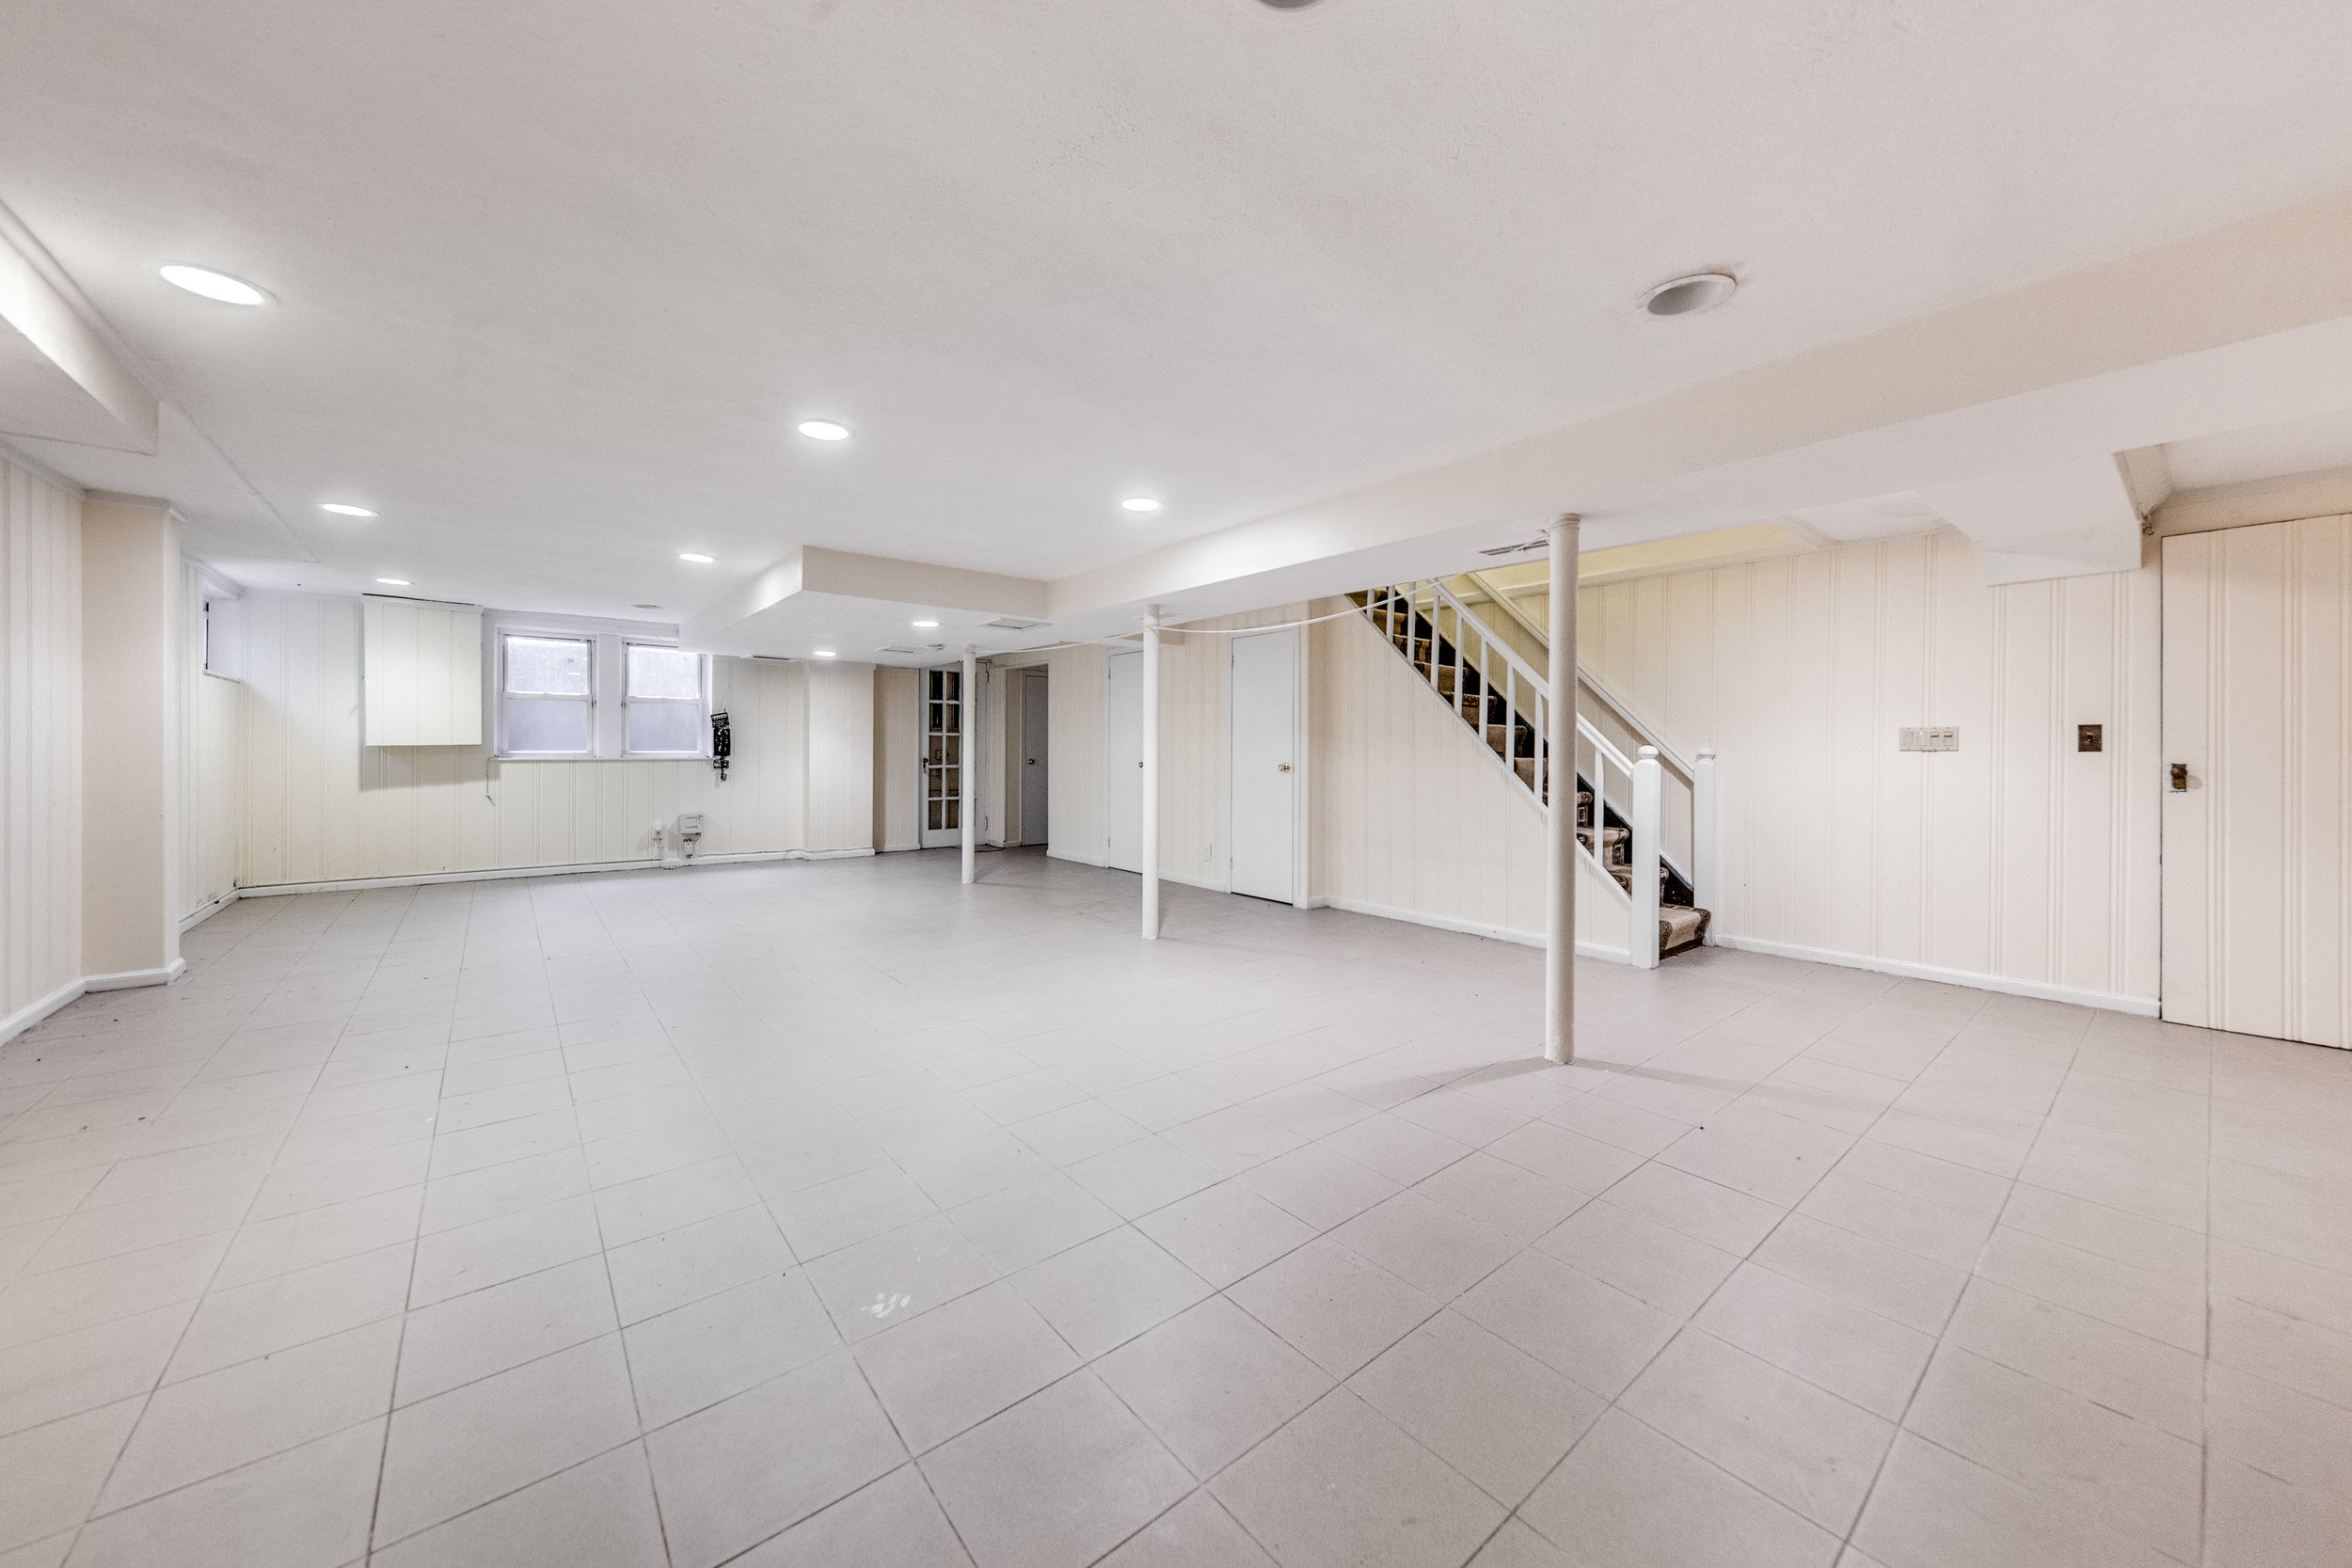 16. basement.jpg